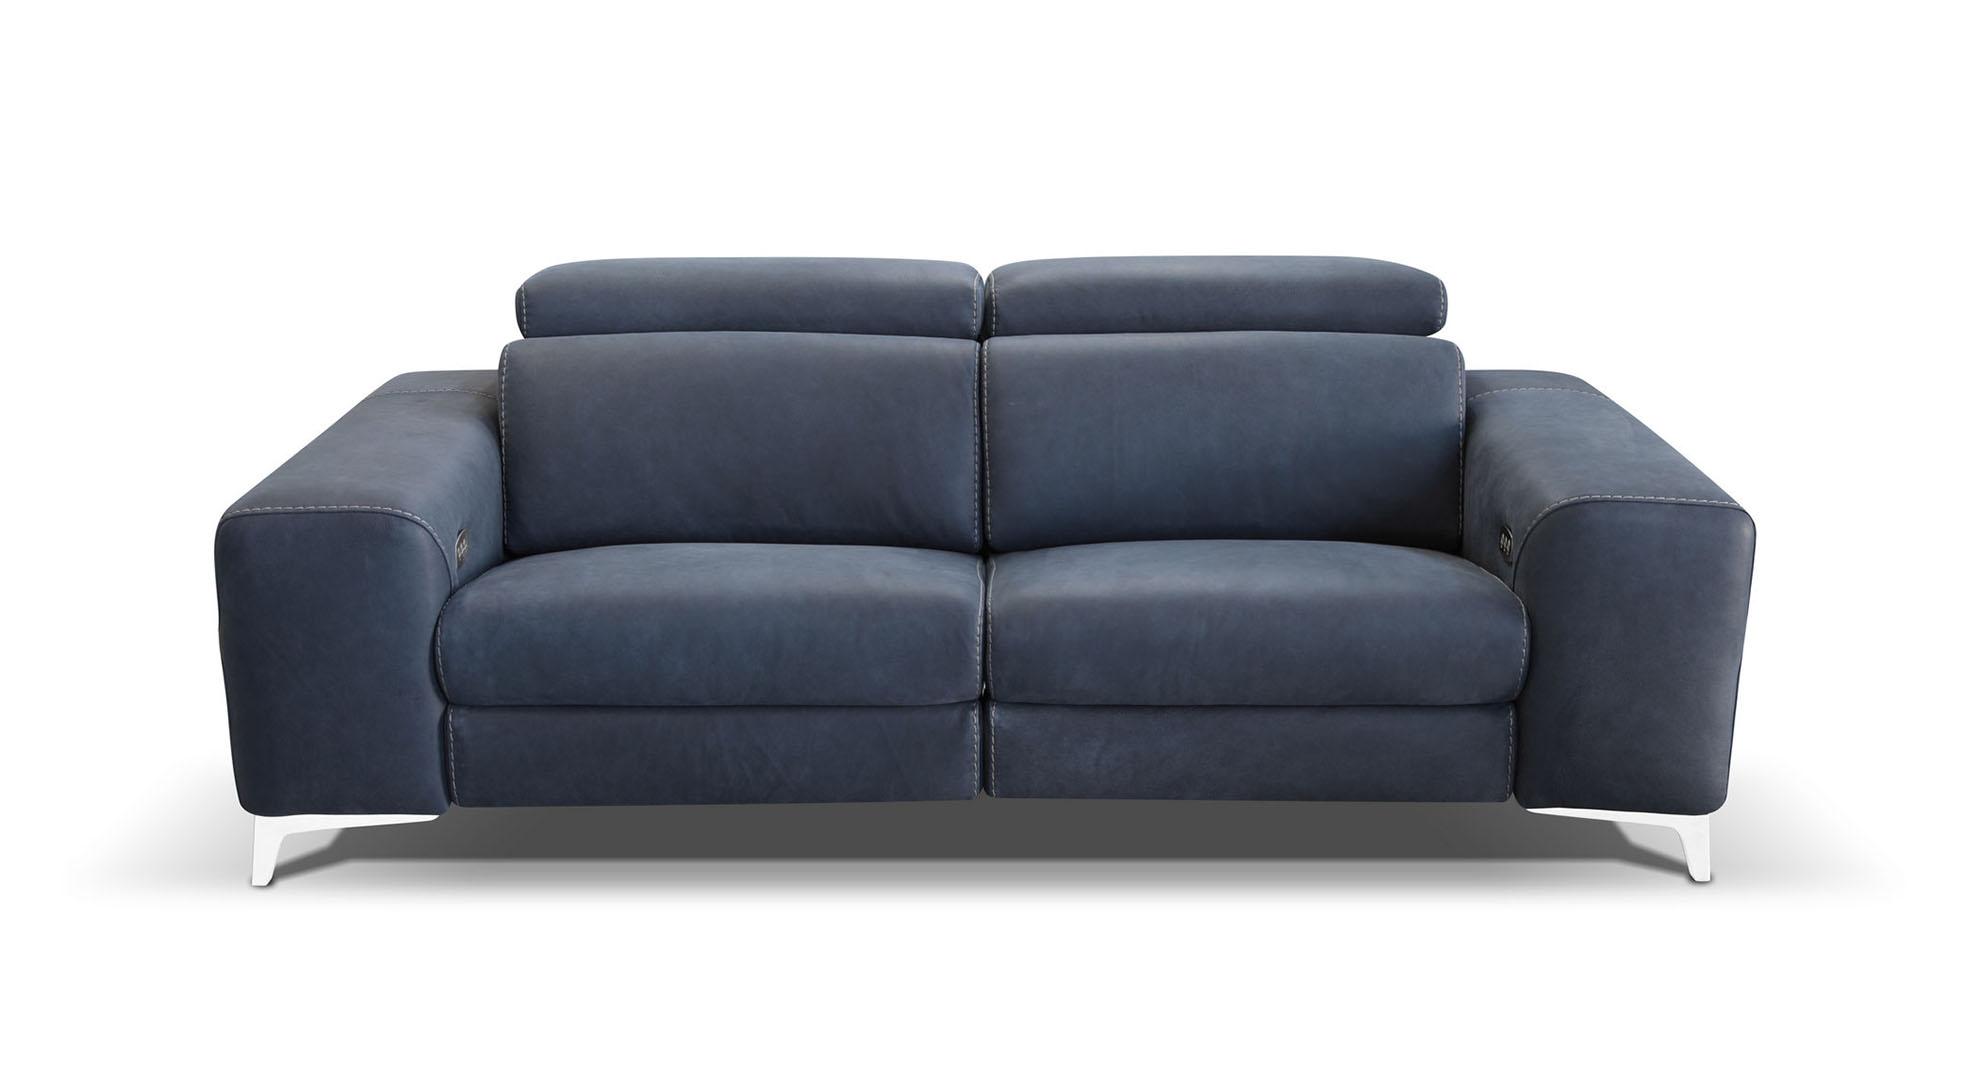 Bracci Eos sofa